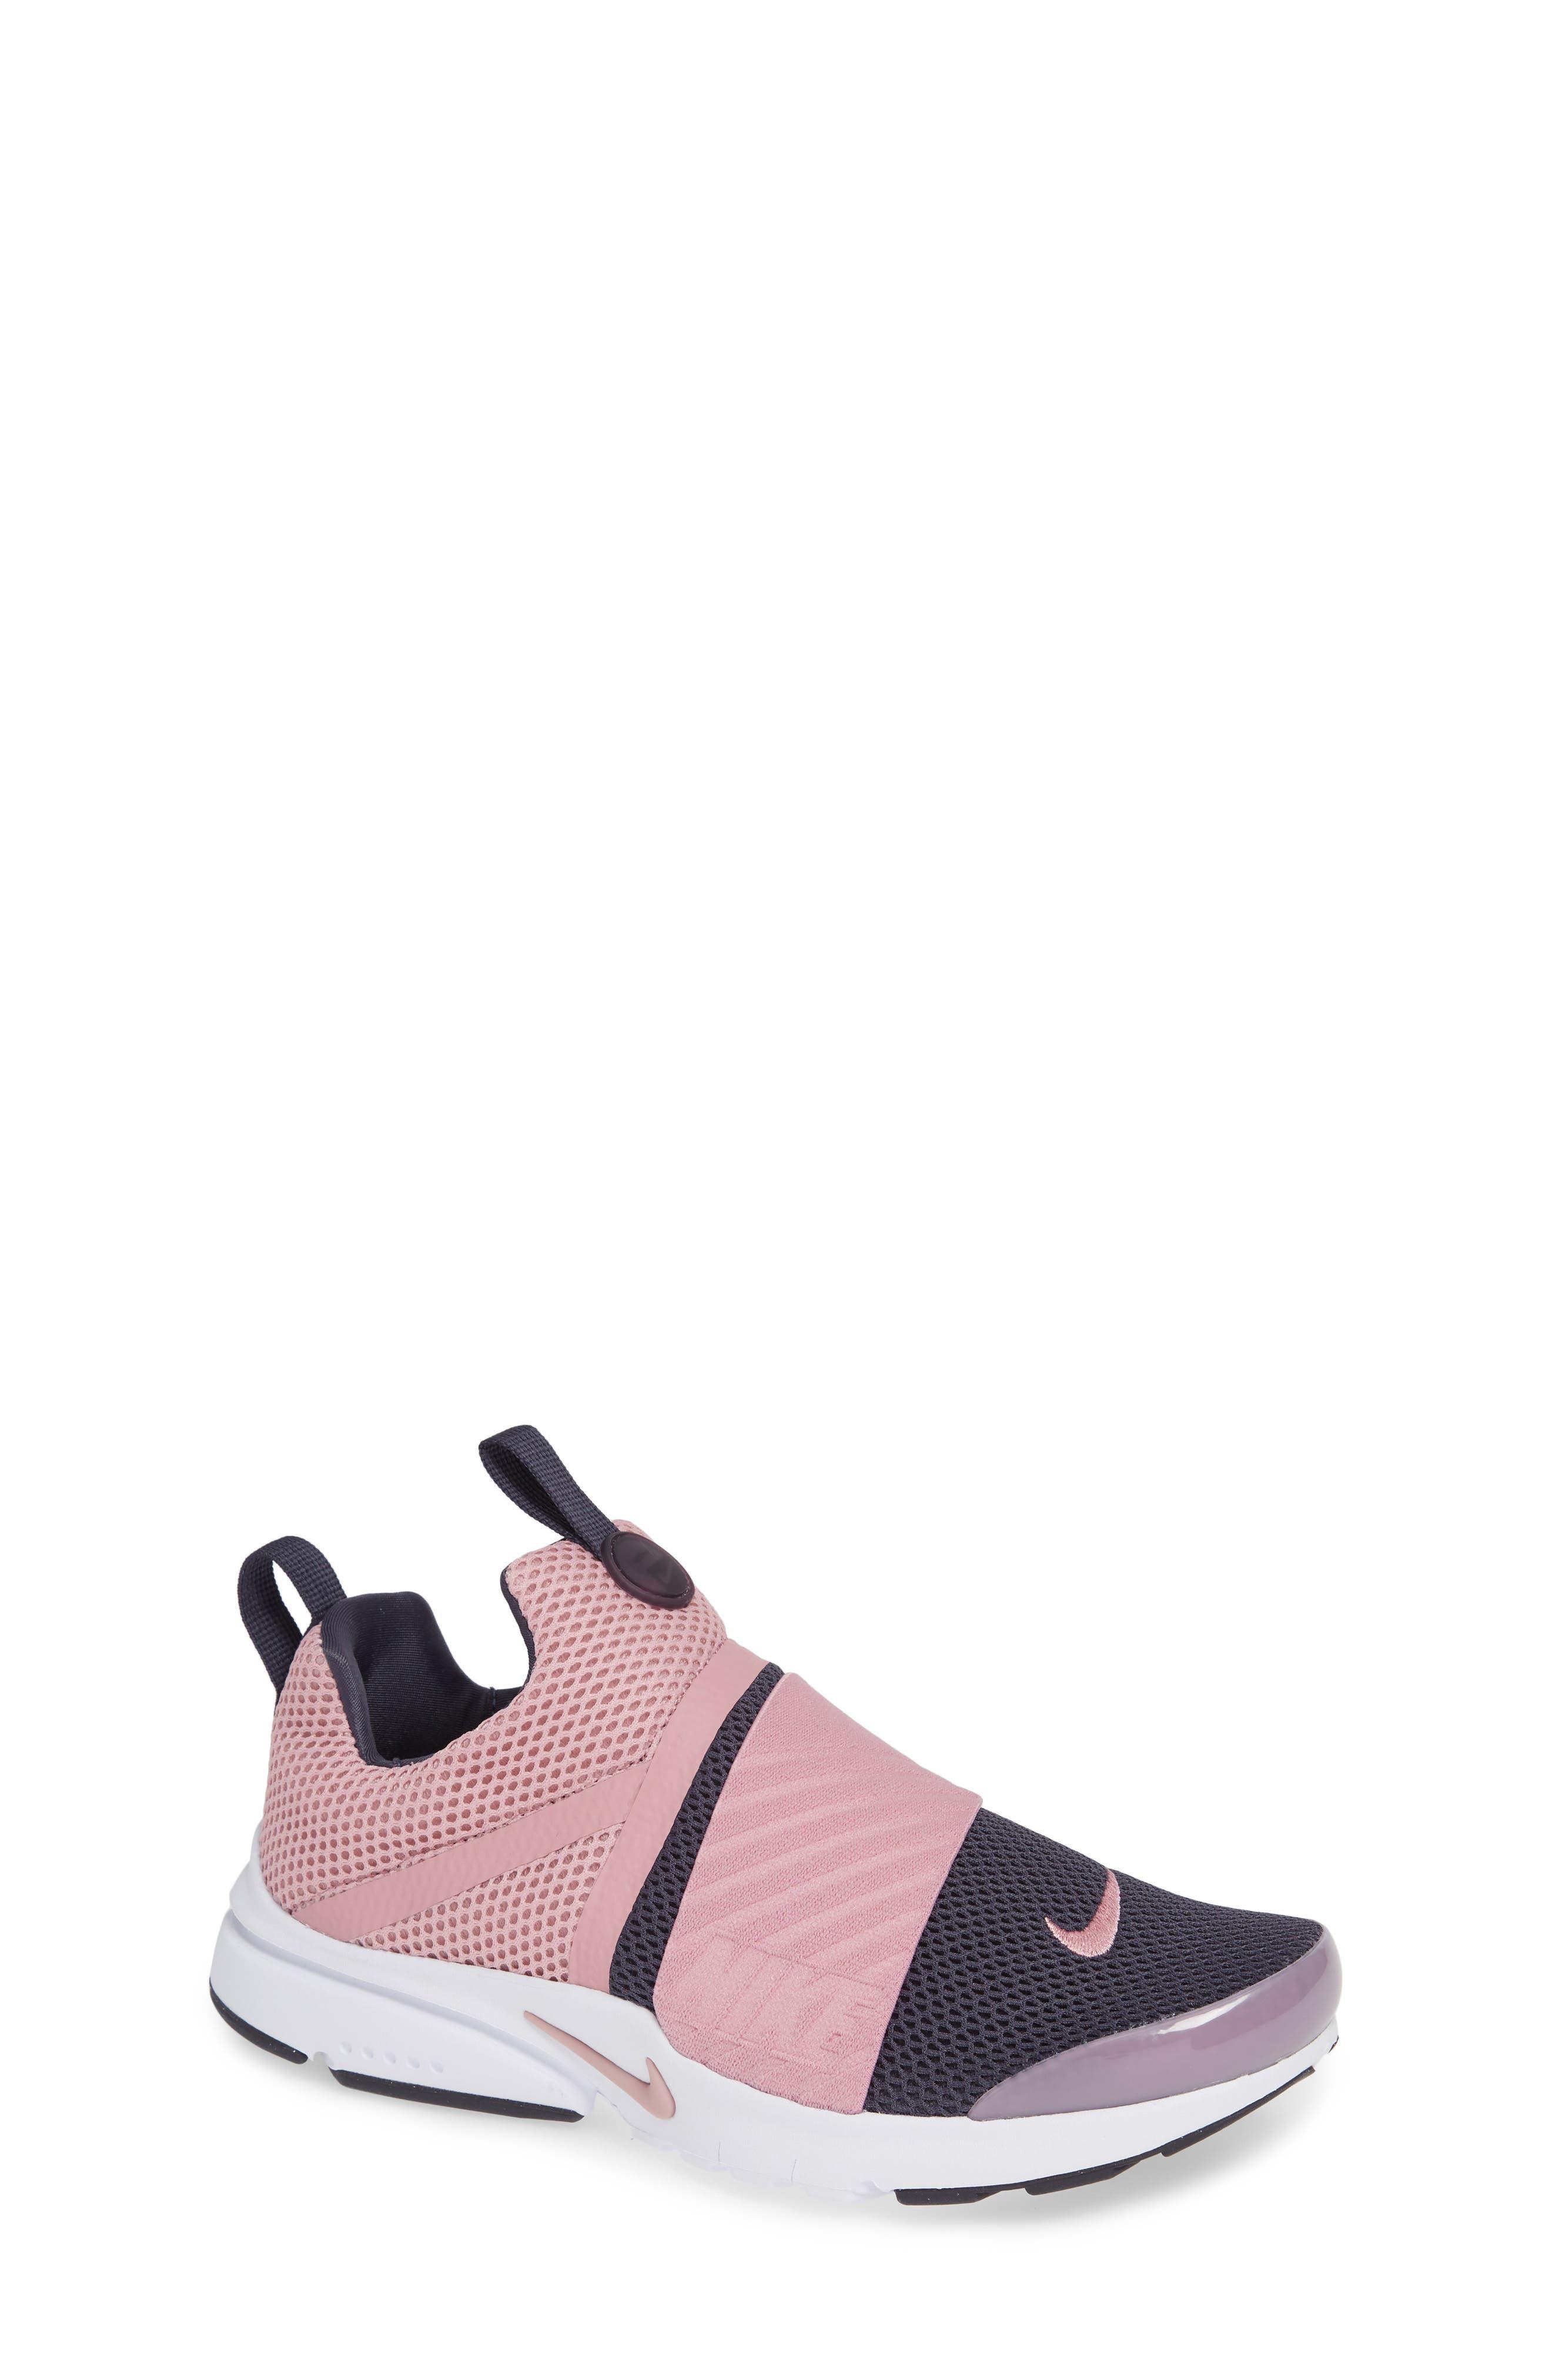 Presto Extreme Sneaker,                             Main thumbnail 1, color,                             ELEMENTAL PINK/ GRIDIRON